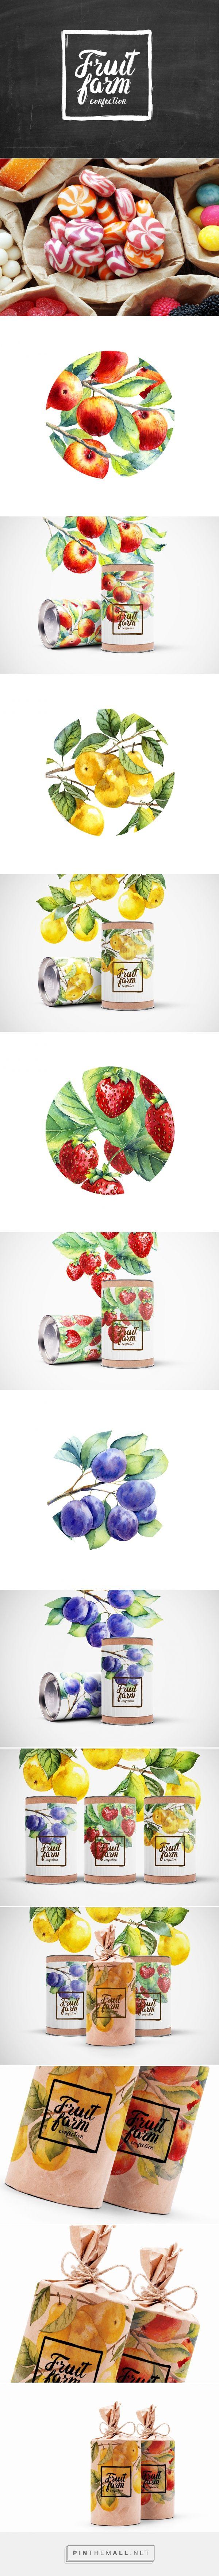 Fruit Farm Confection / candies by Rina Rusyaeva